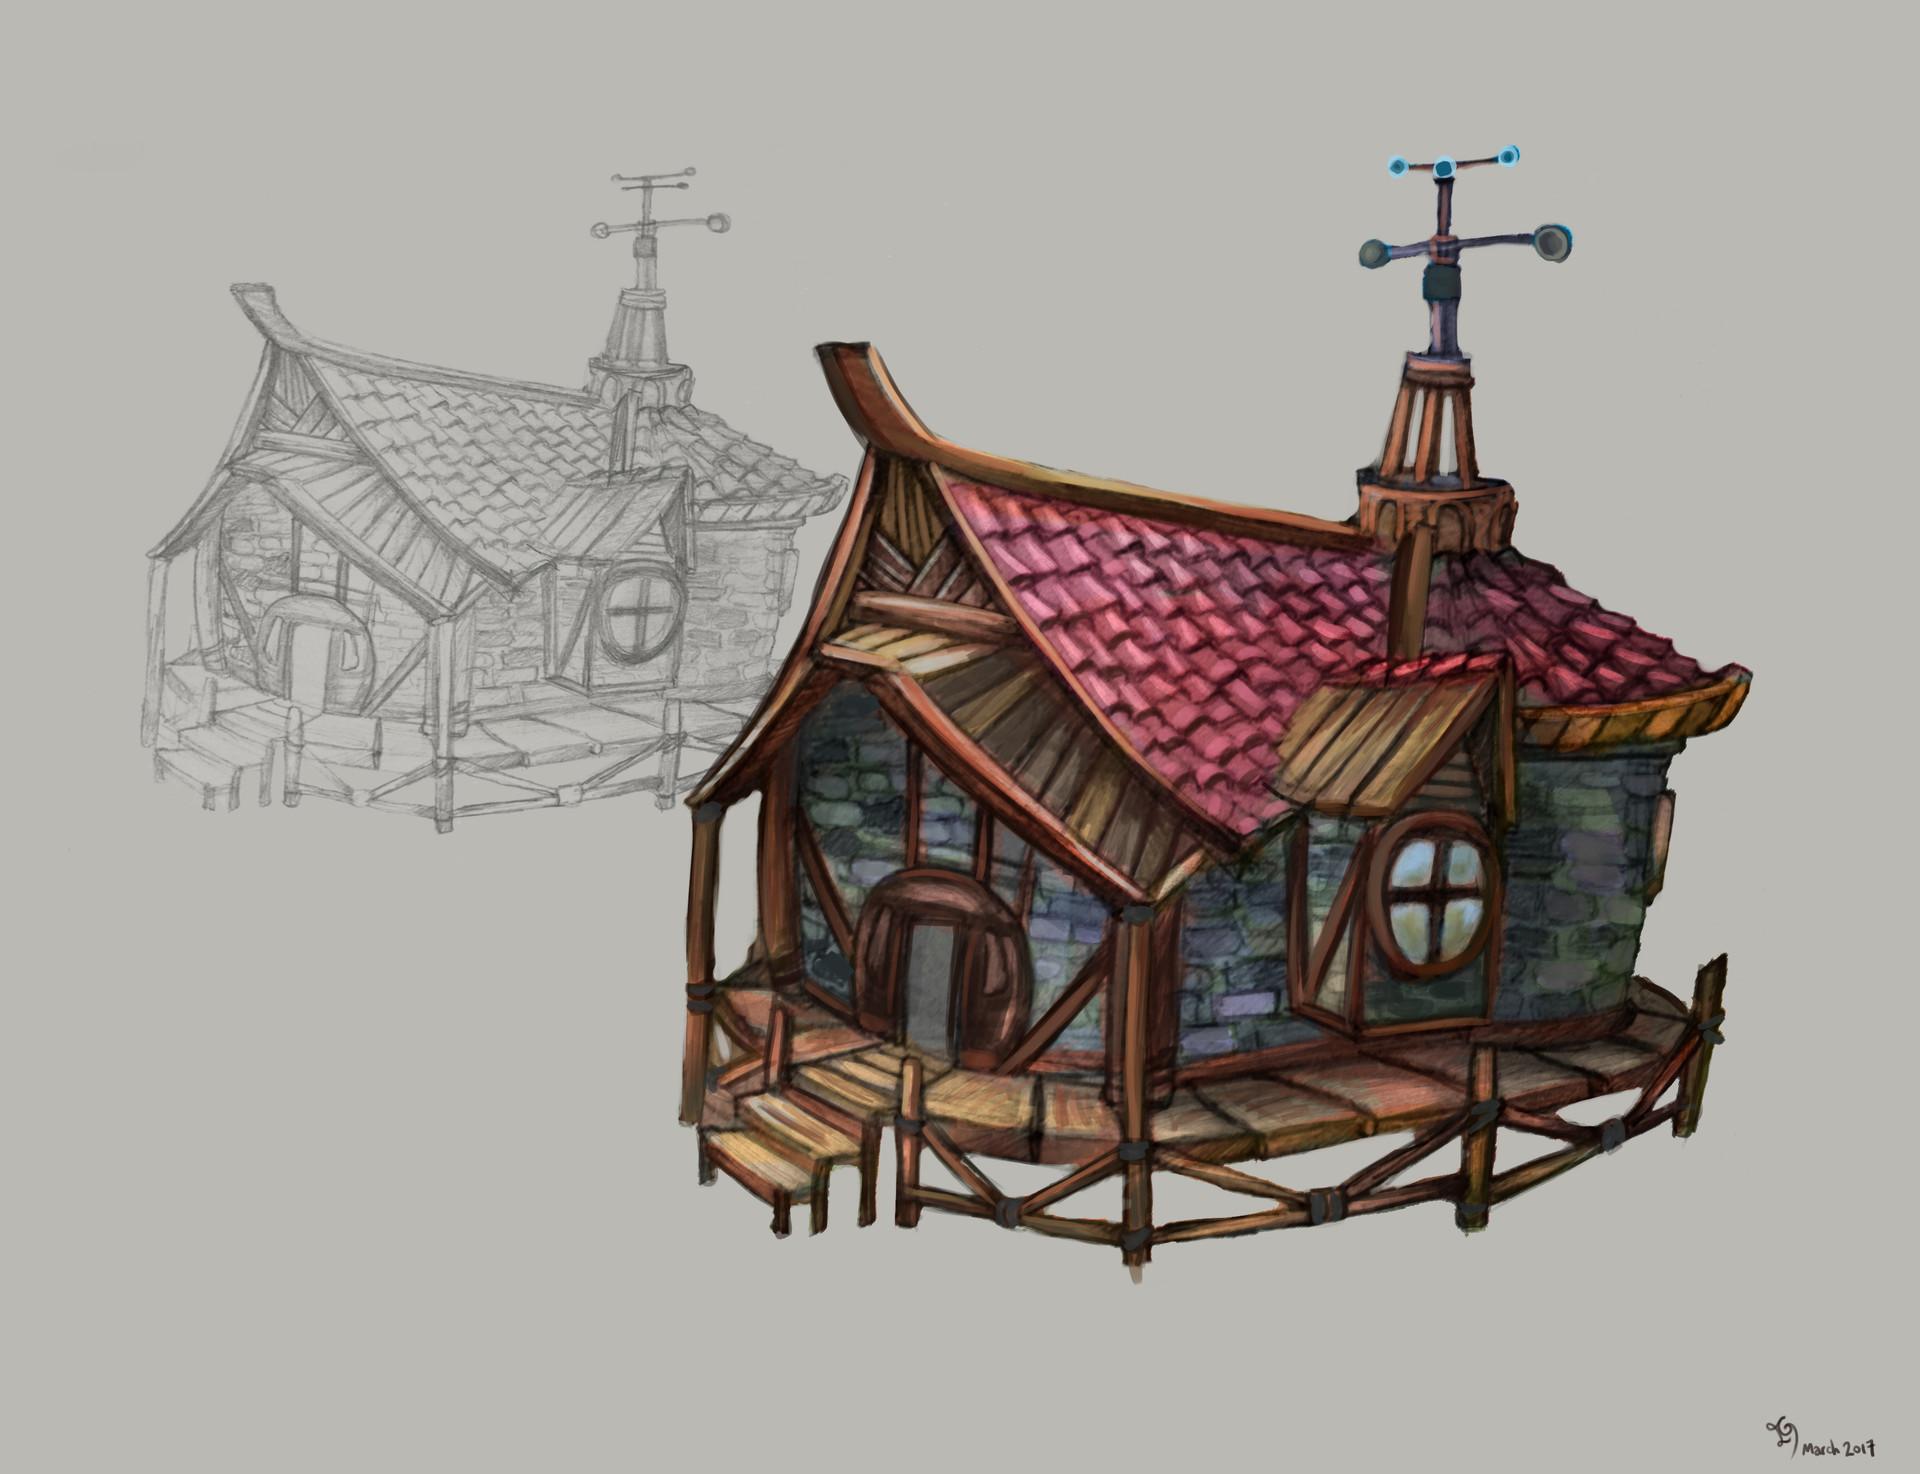 Hut concept. The